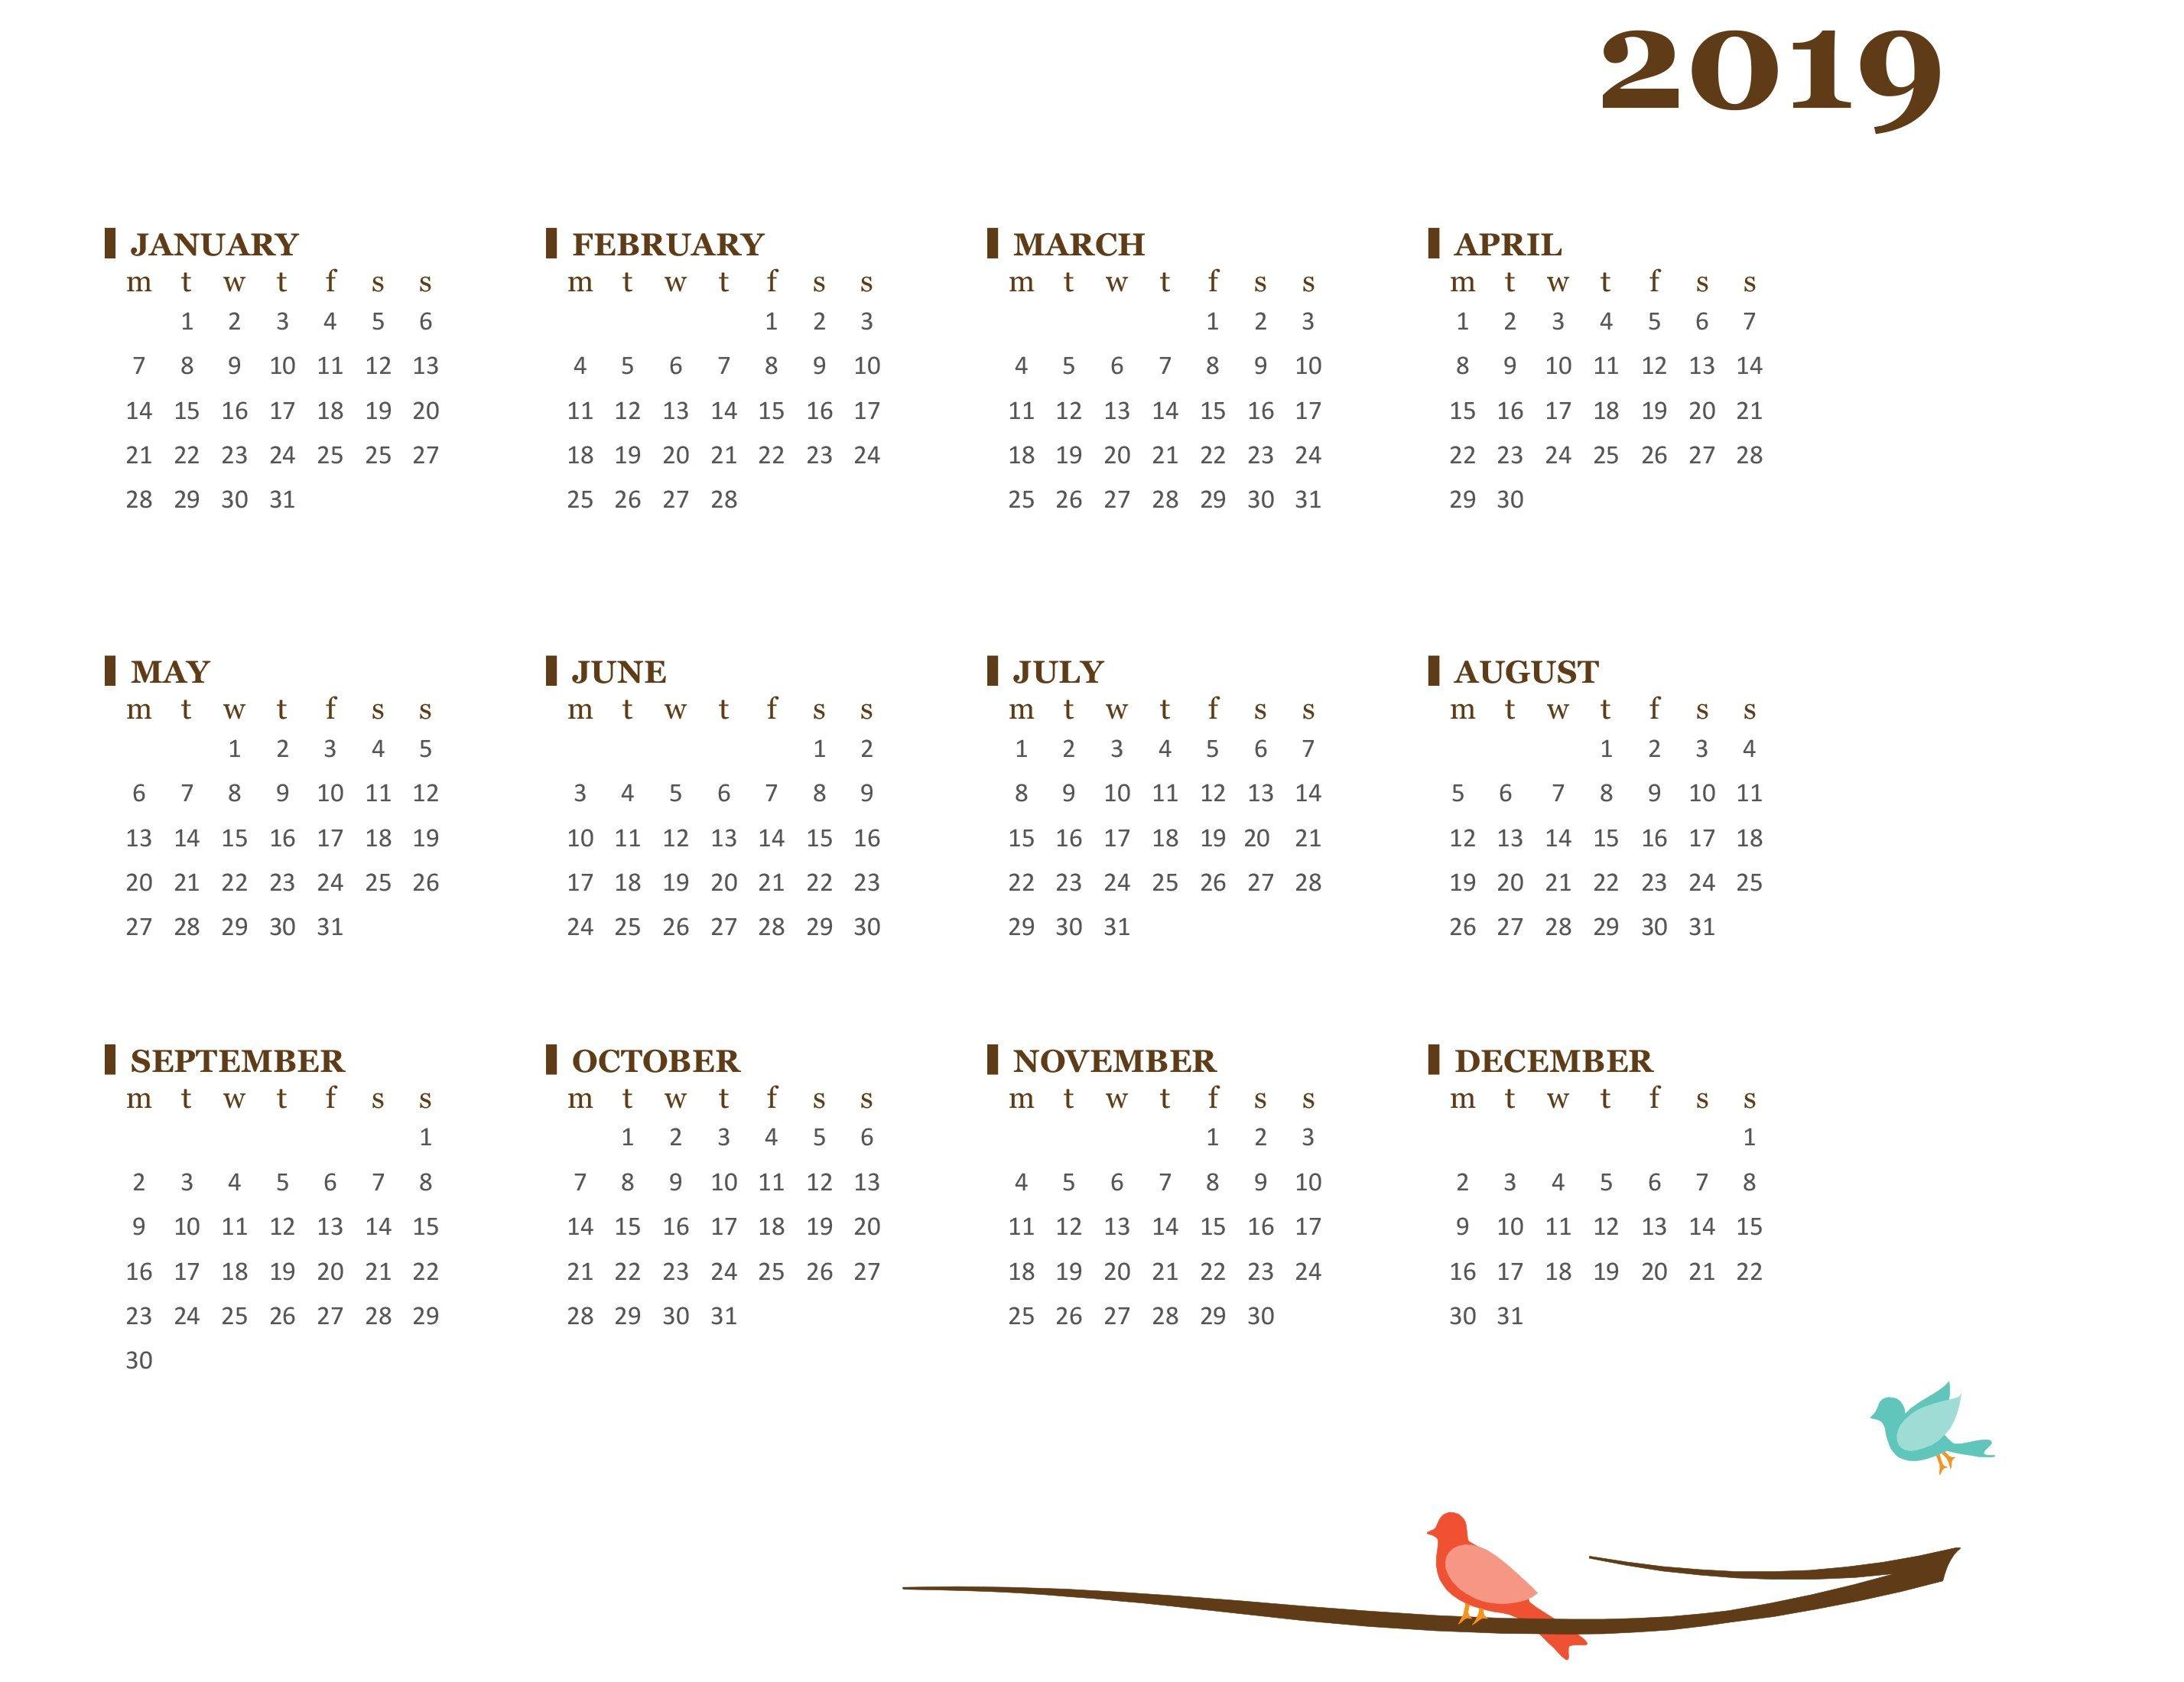 2019 Yearly Calendar (Mon Sun) Calendar 2019 Full Year